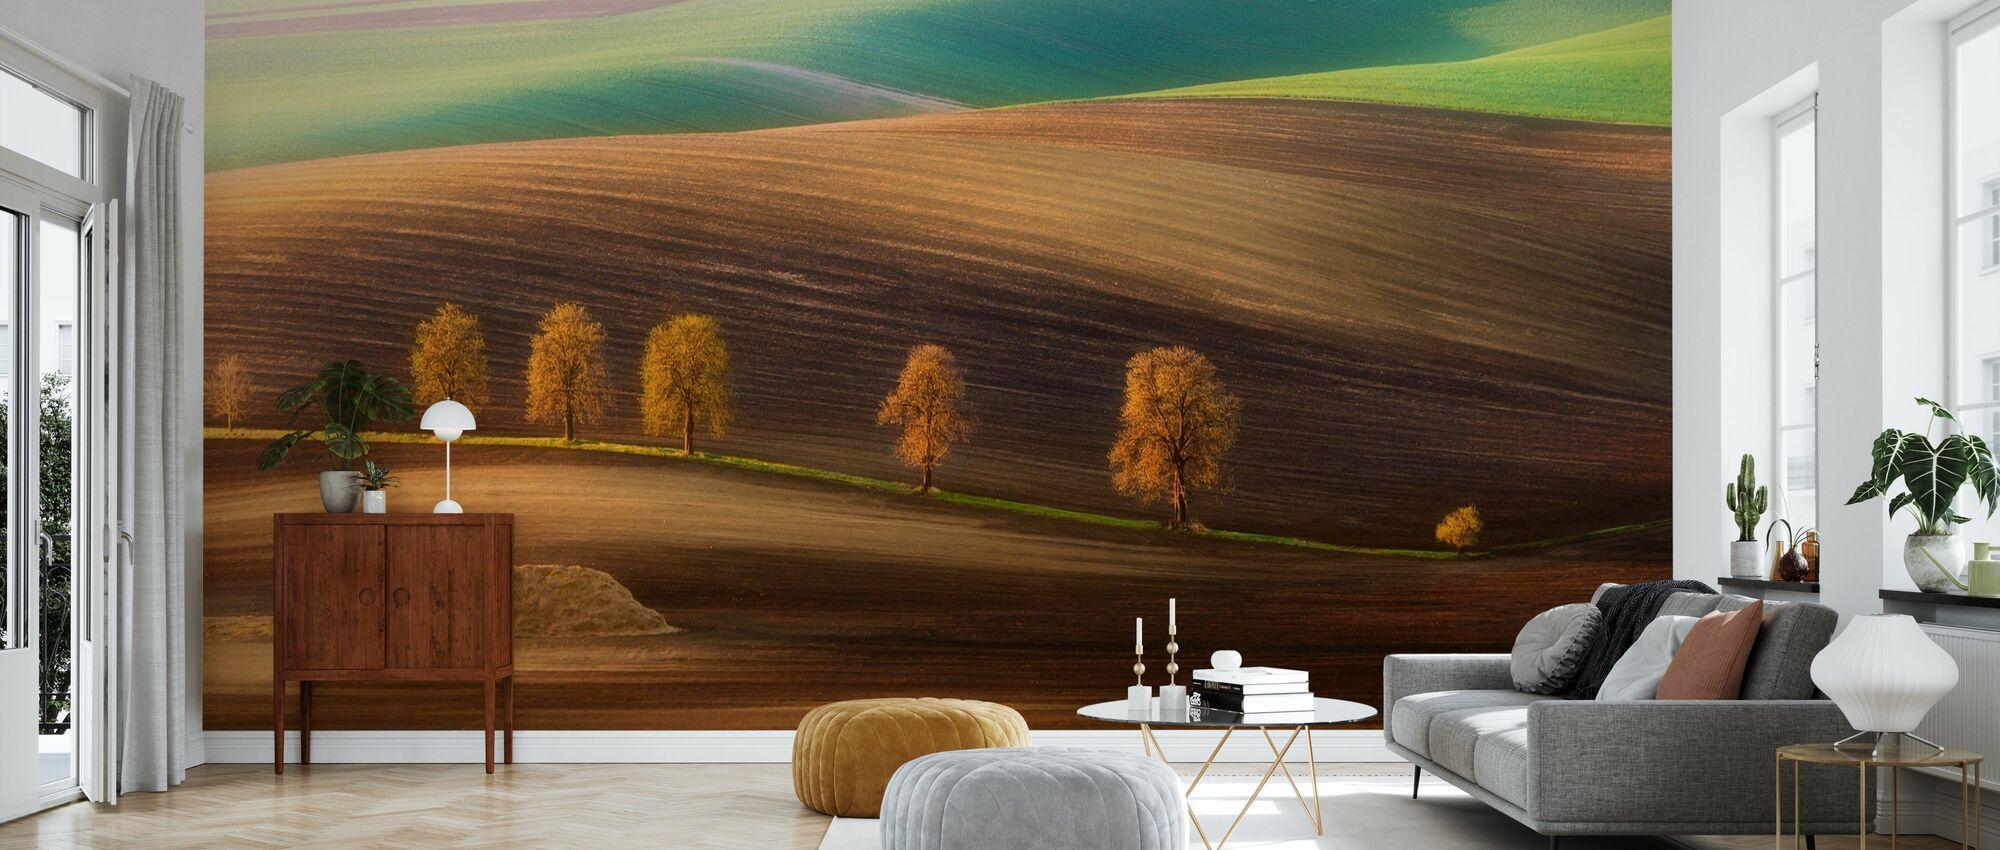 Moravian Trees - Wallpaper - Living Room